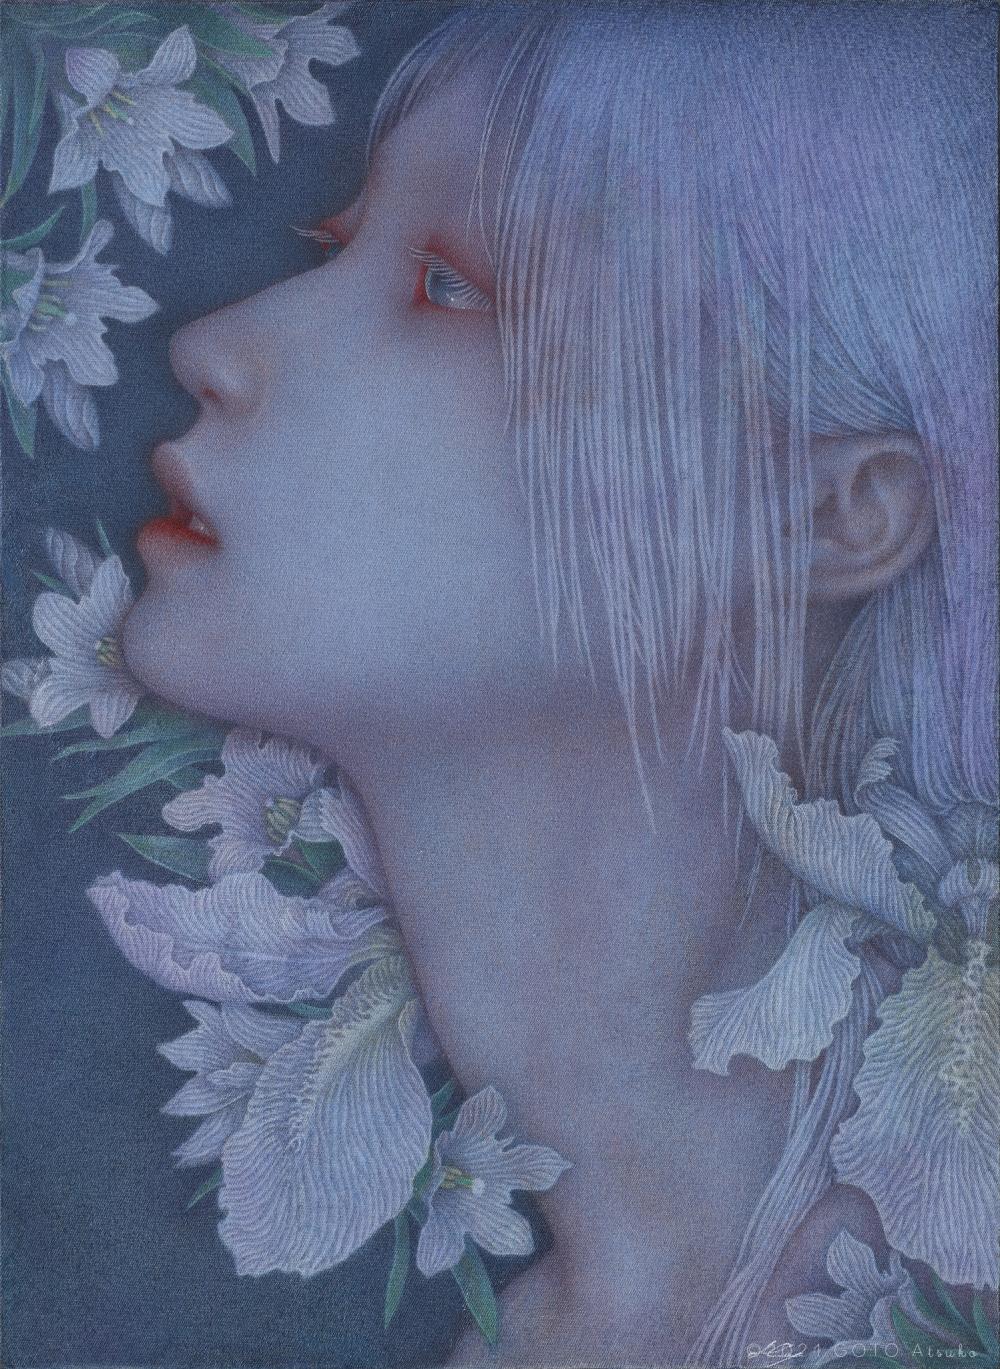 後藤 温子/氷室の華/exid32367wid31019